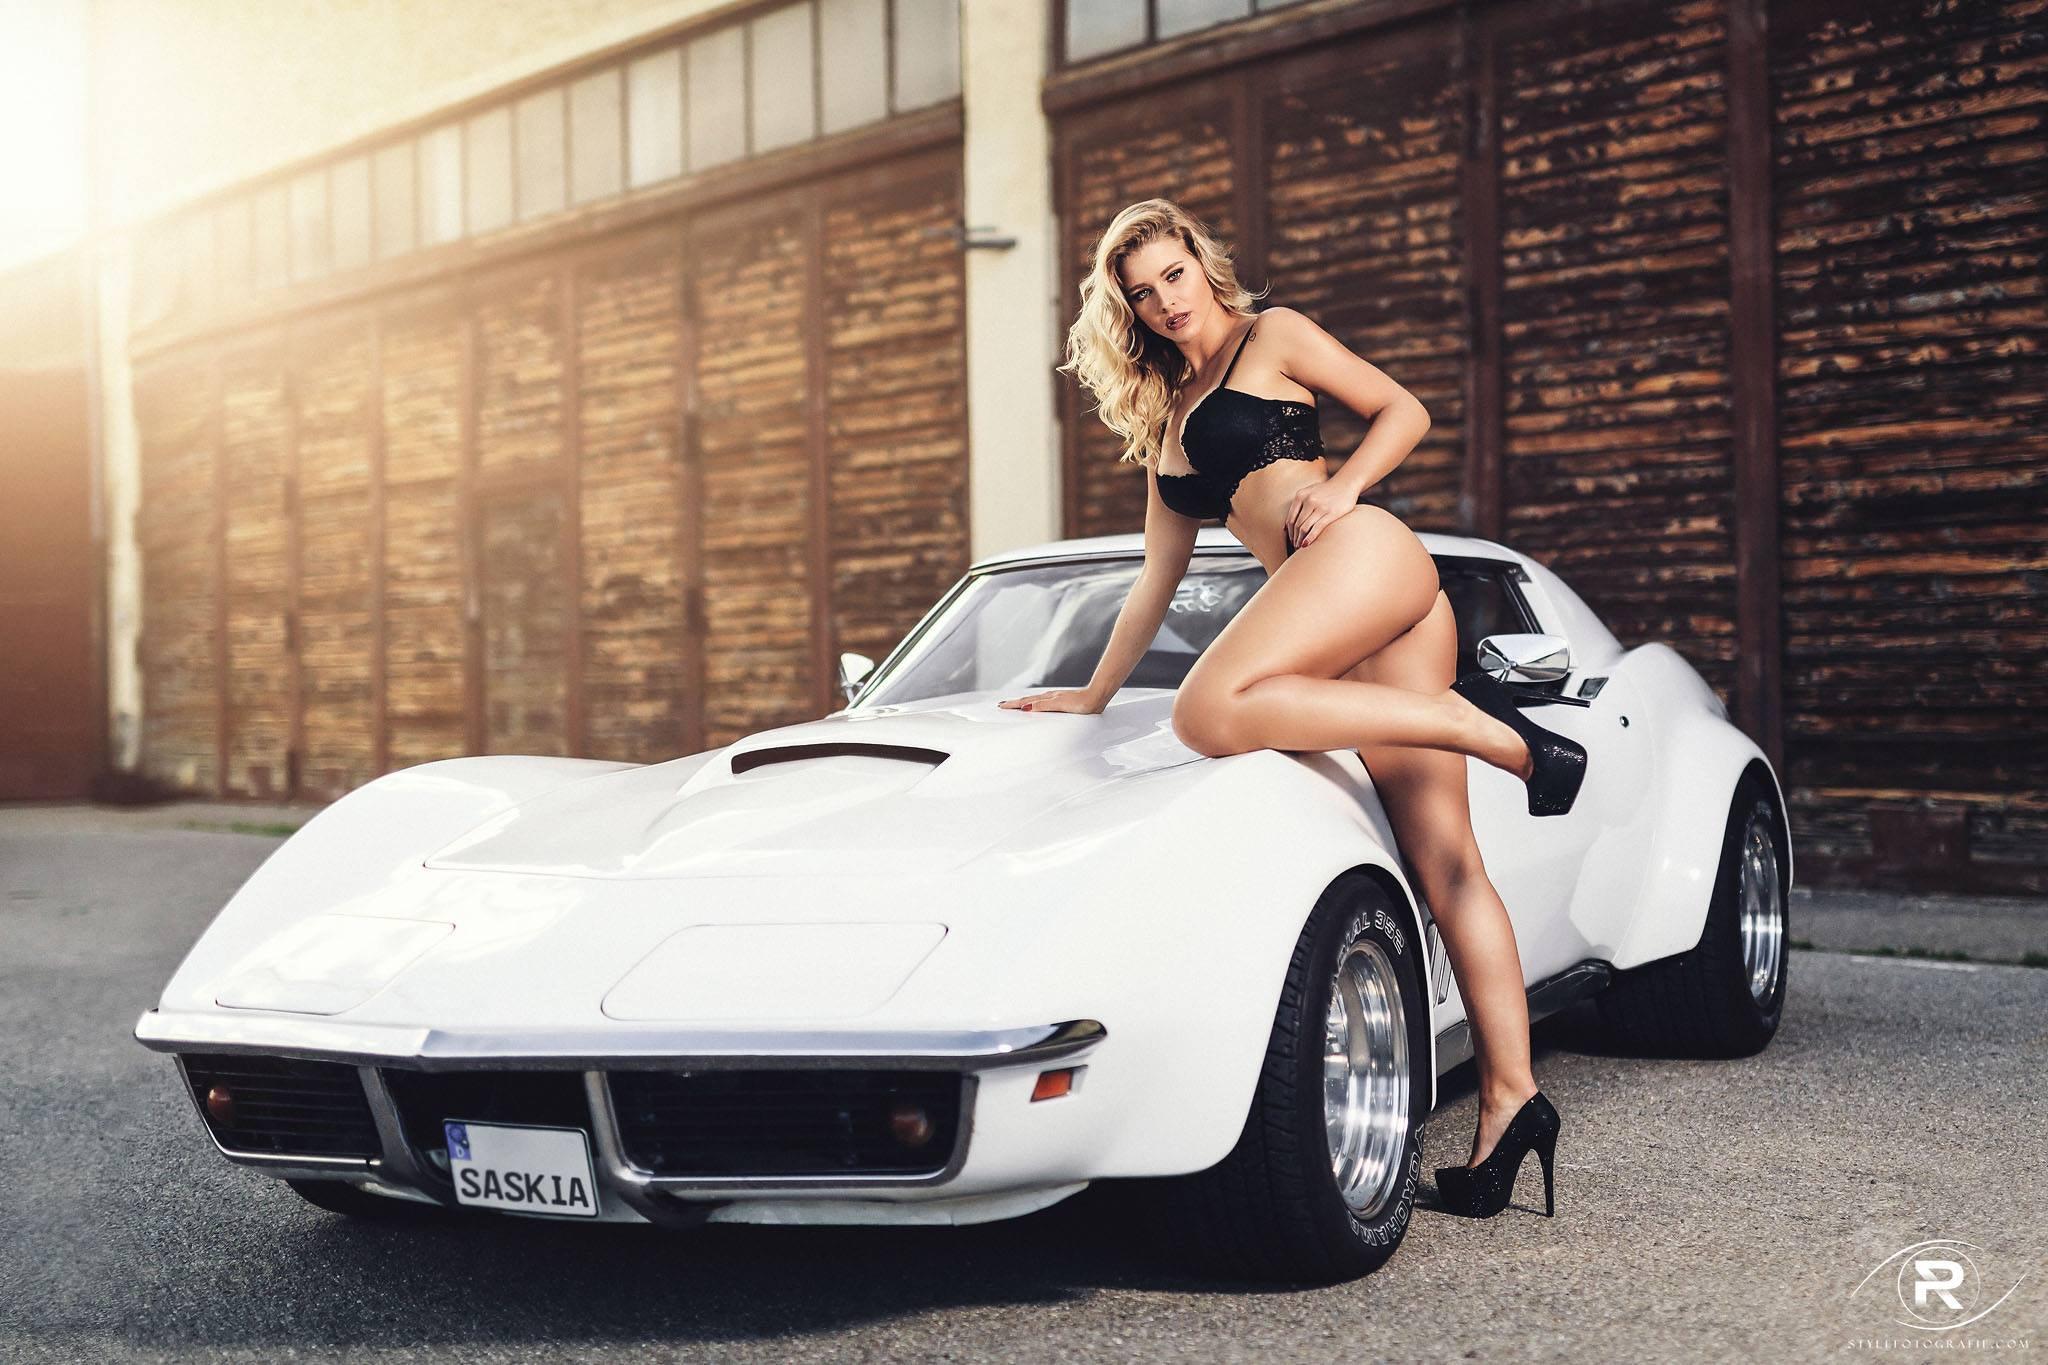 Malinda hot corvette